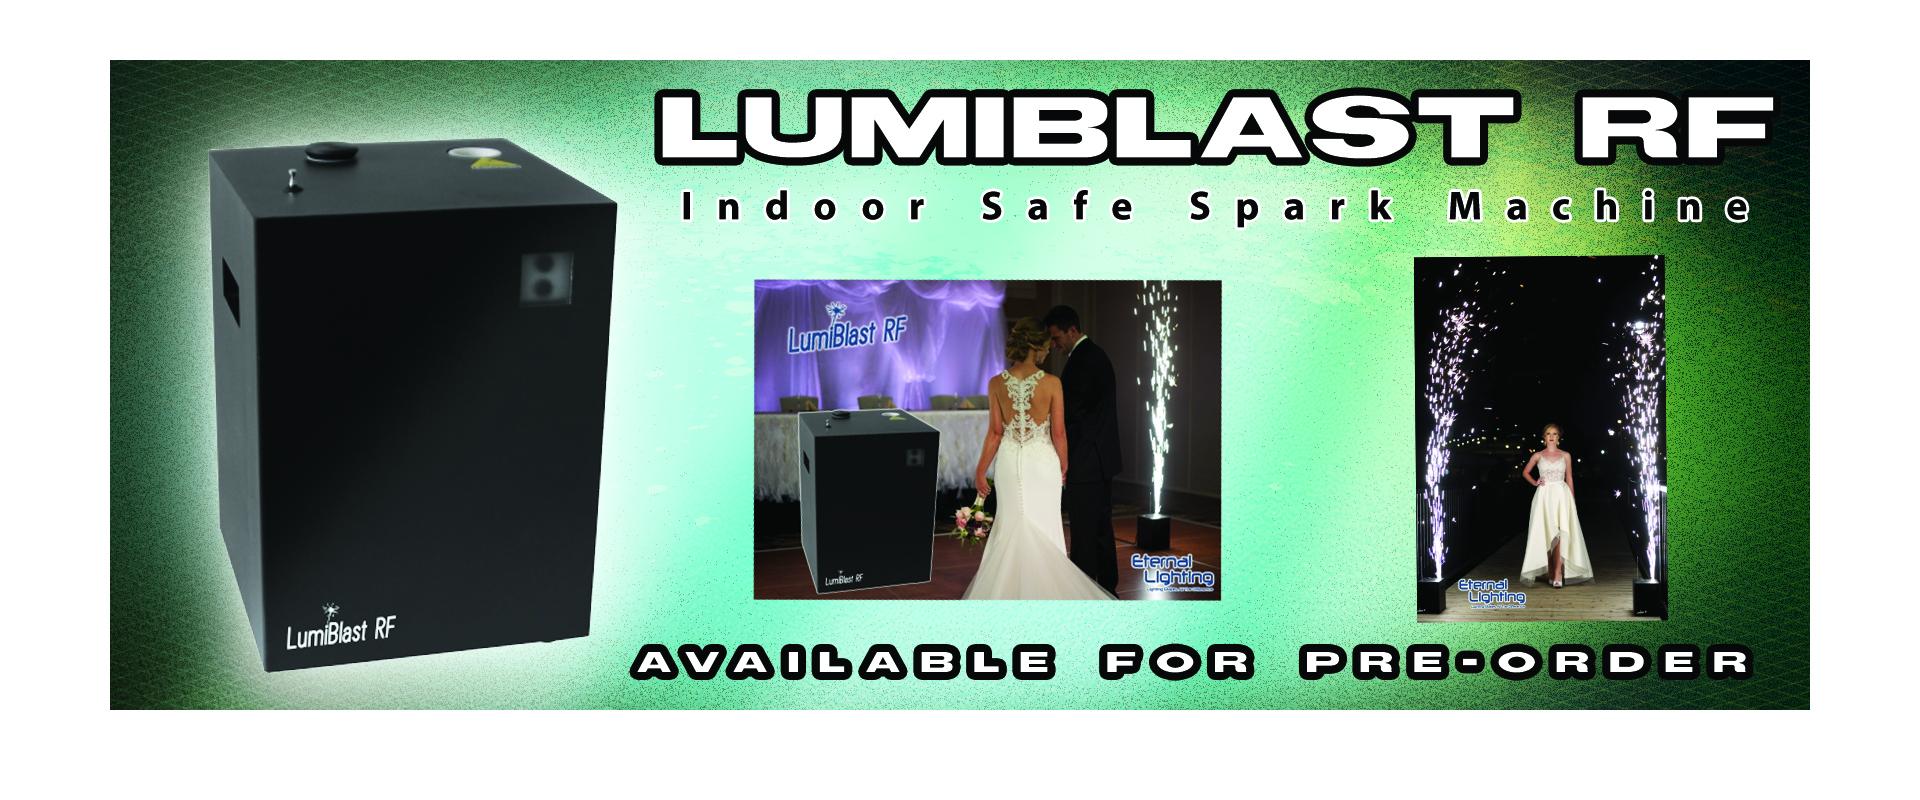 Pre-Order Lumiblast RF Spark Machine Today